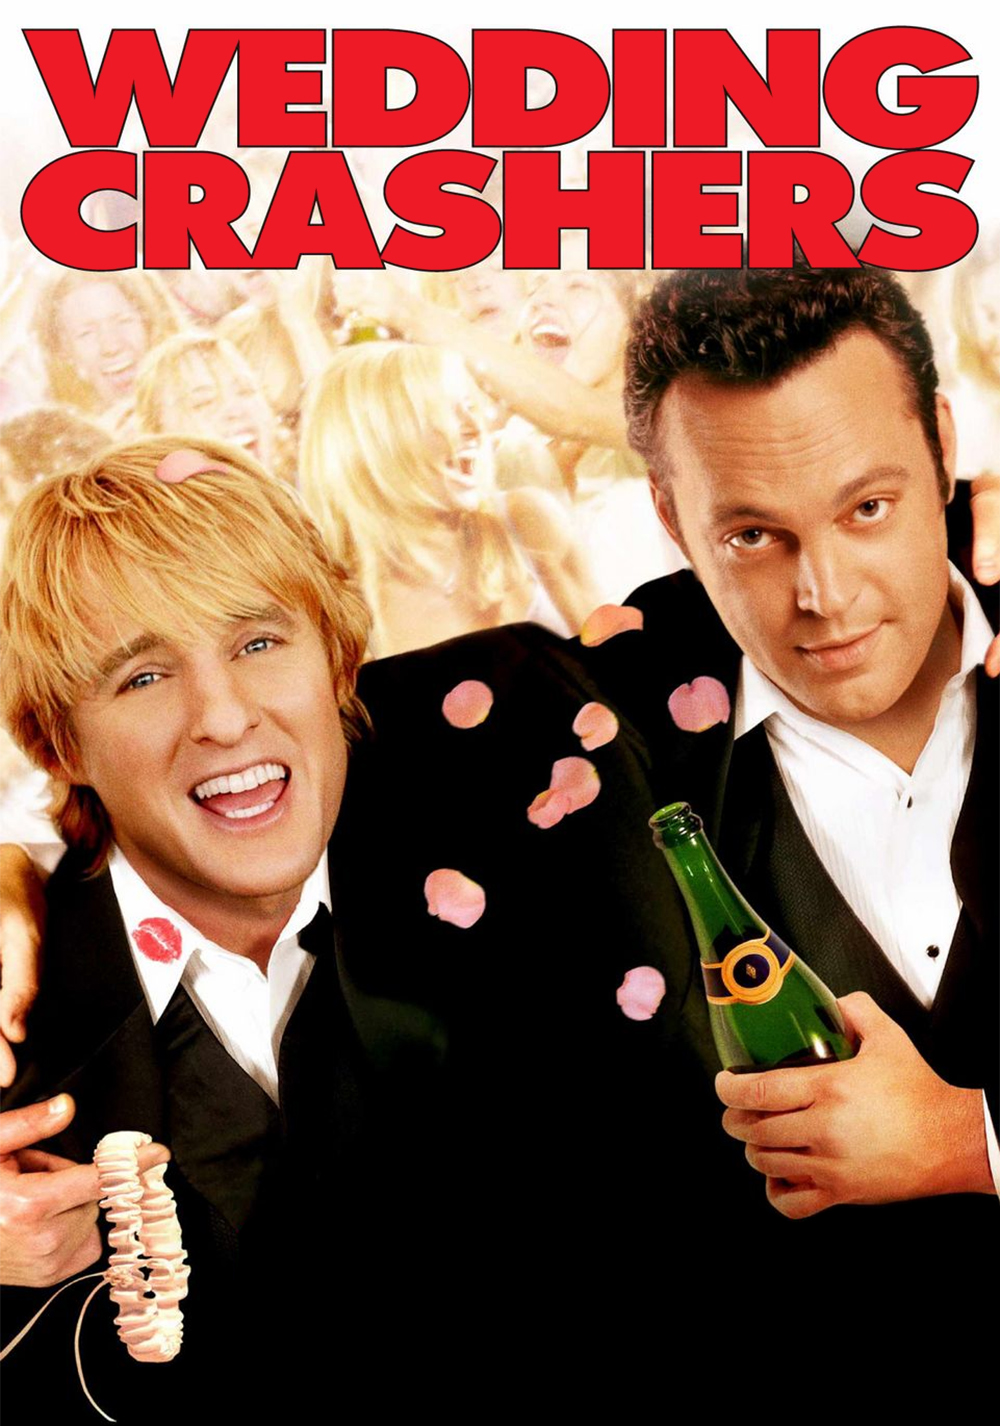 Vince vaughn wedding crashers dating